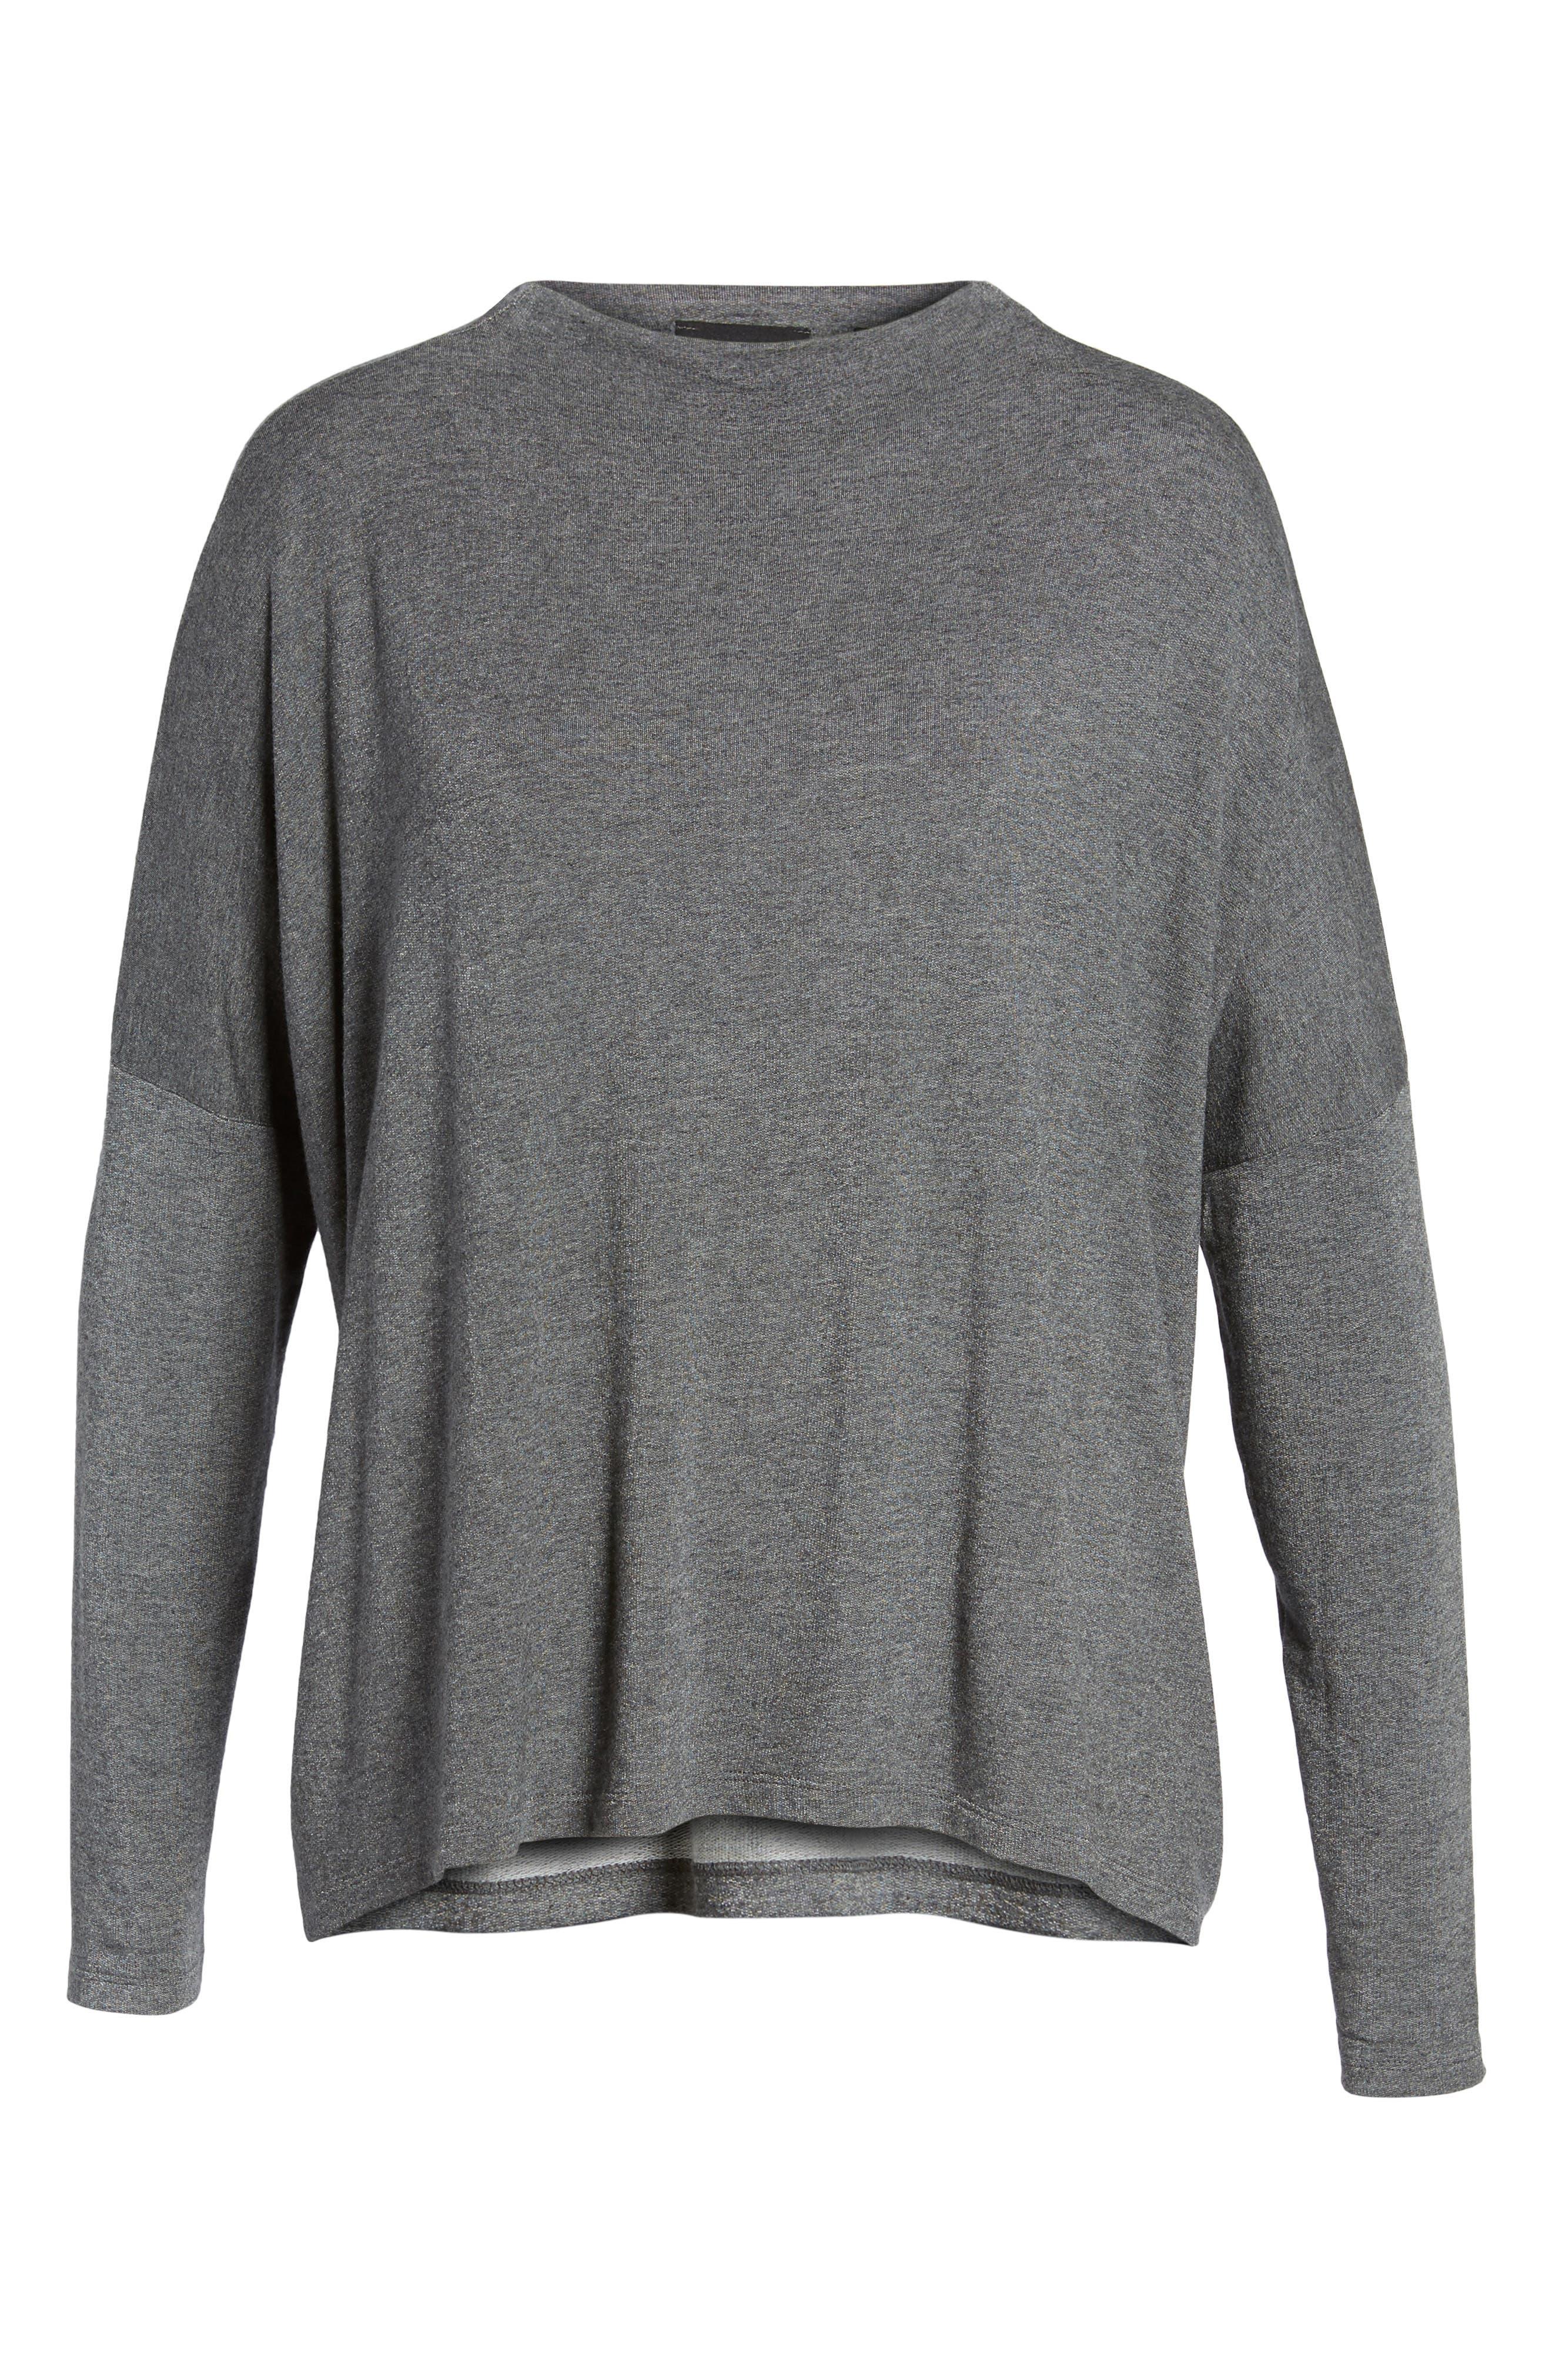 High Neck Sweatshirt,                             Alternate thumbnail 12, color,